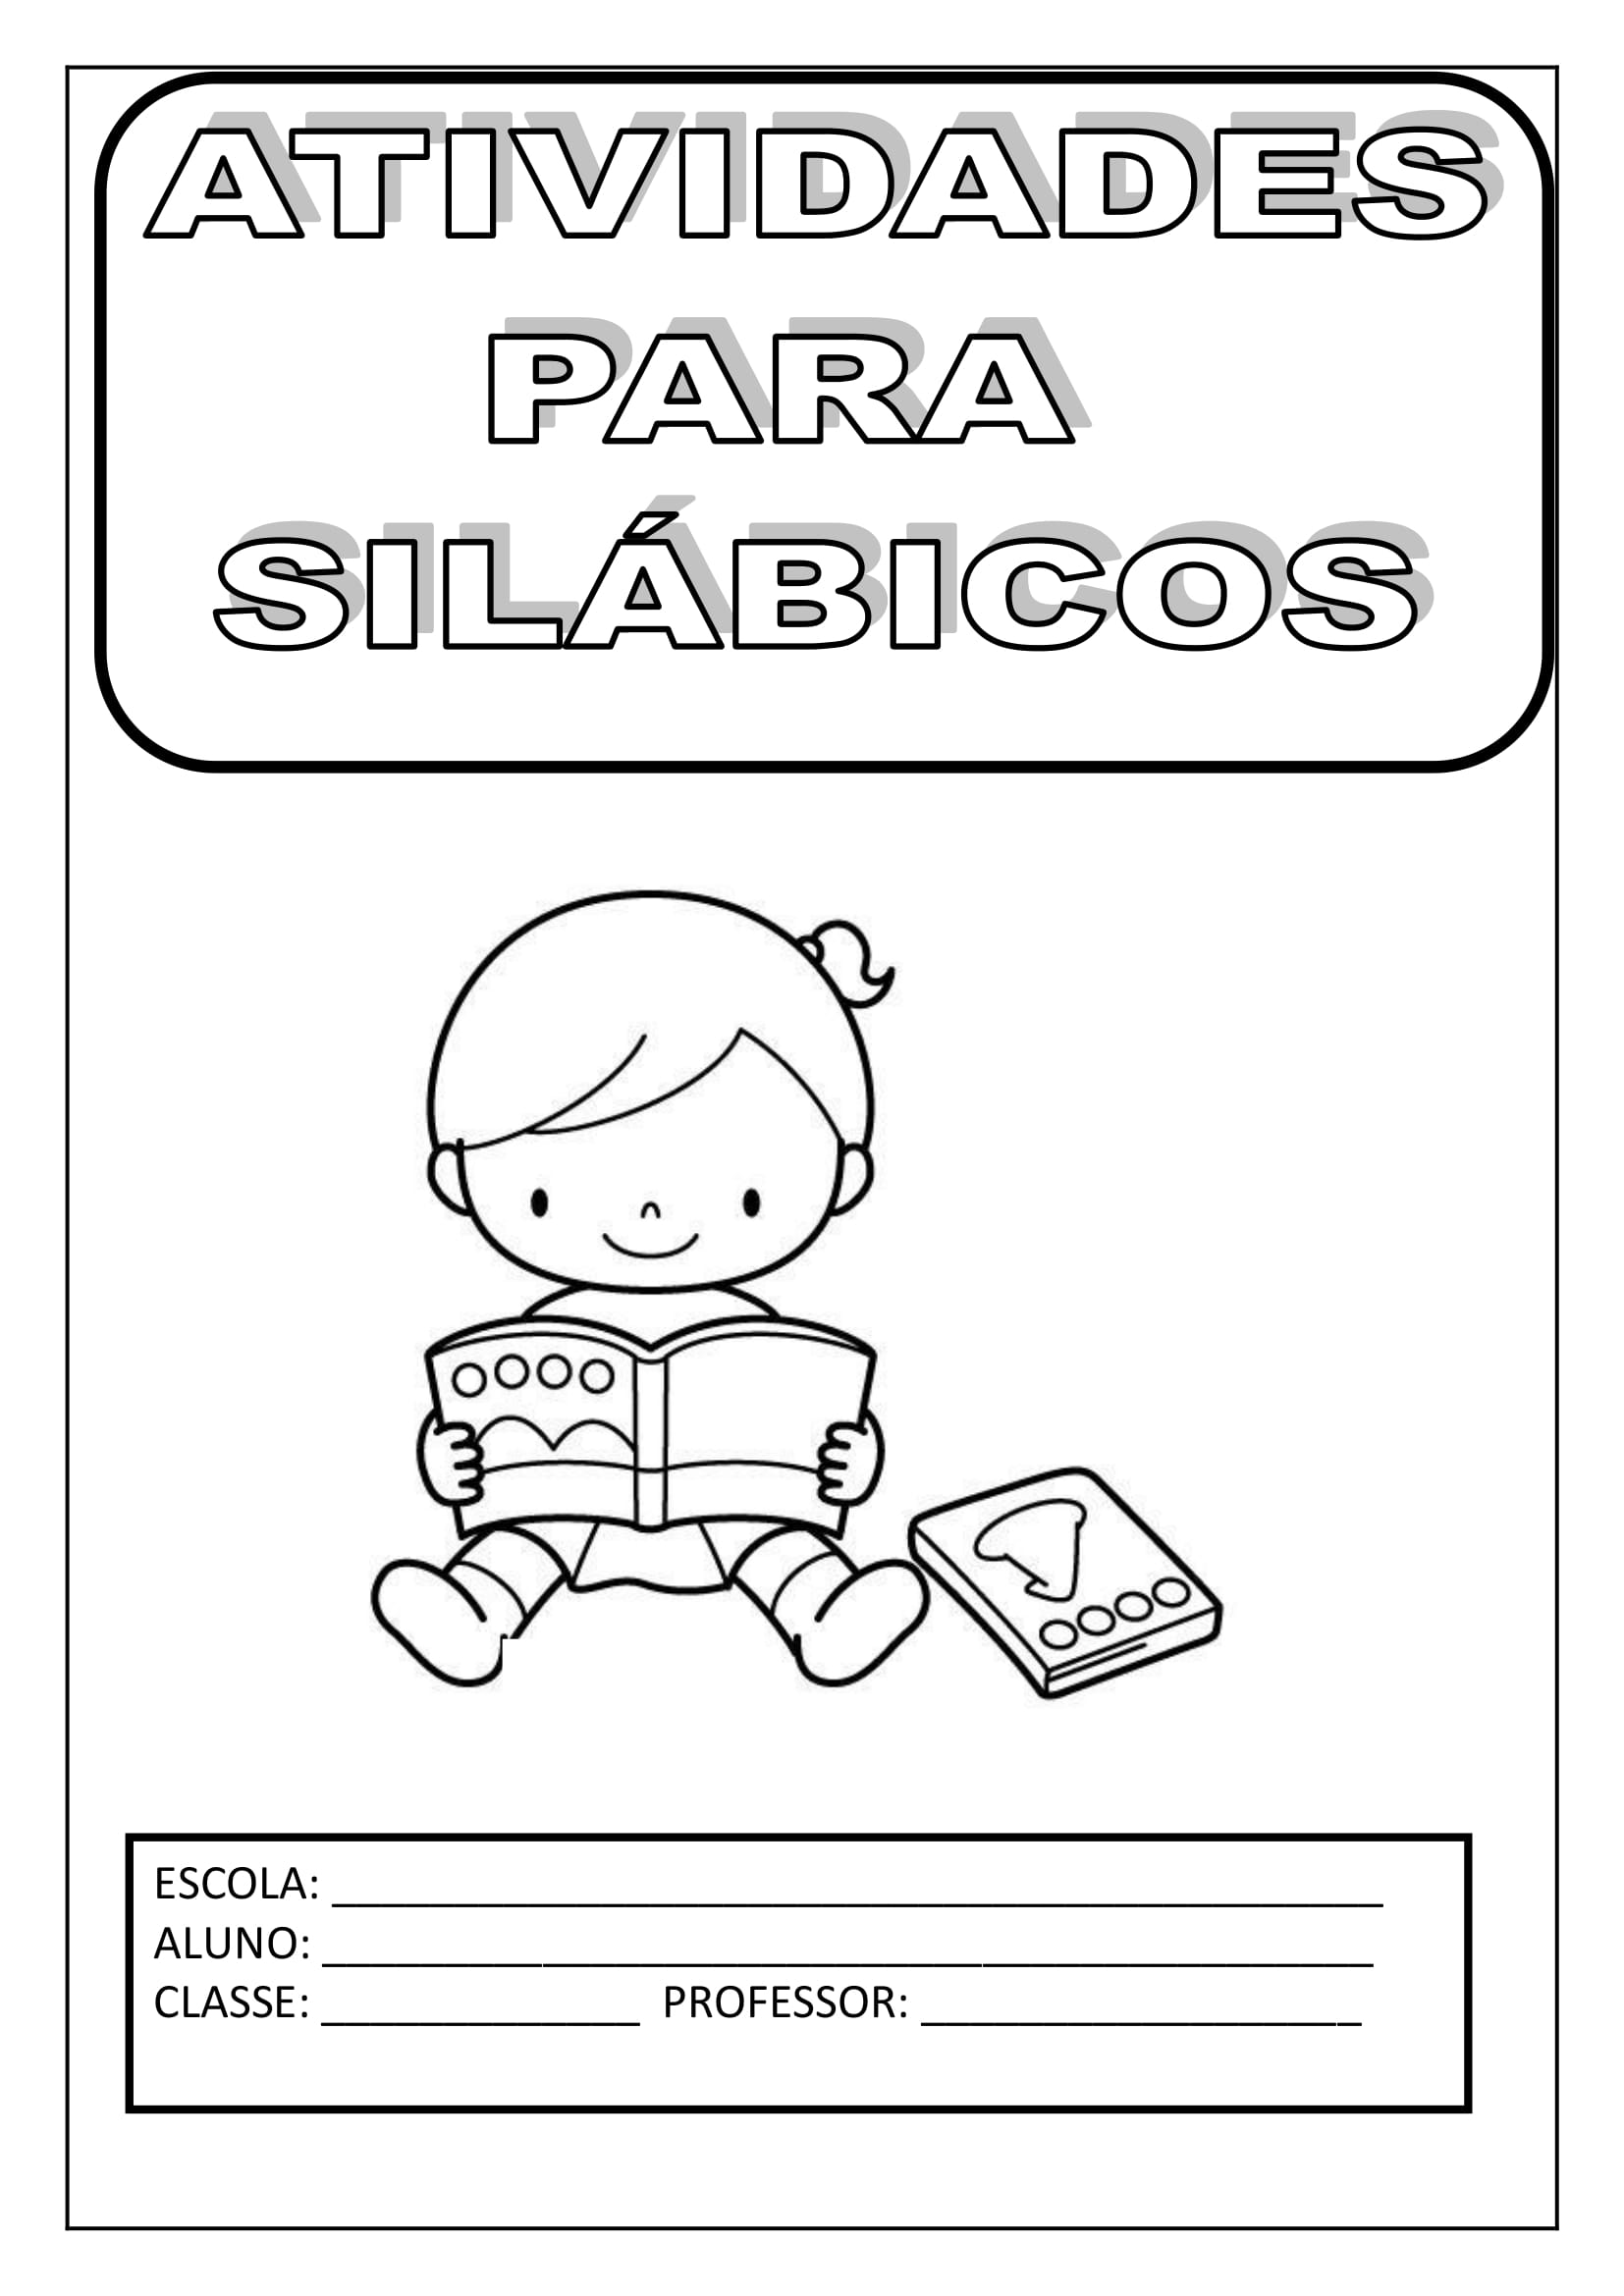 Imprimir_atividades_para_silabicos-01